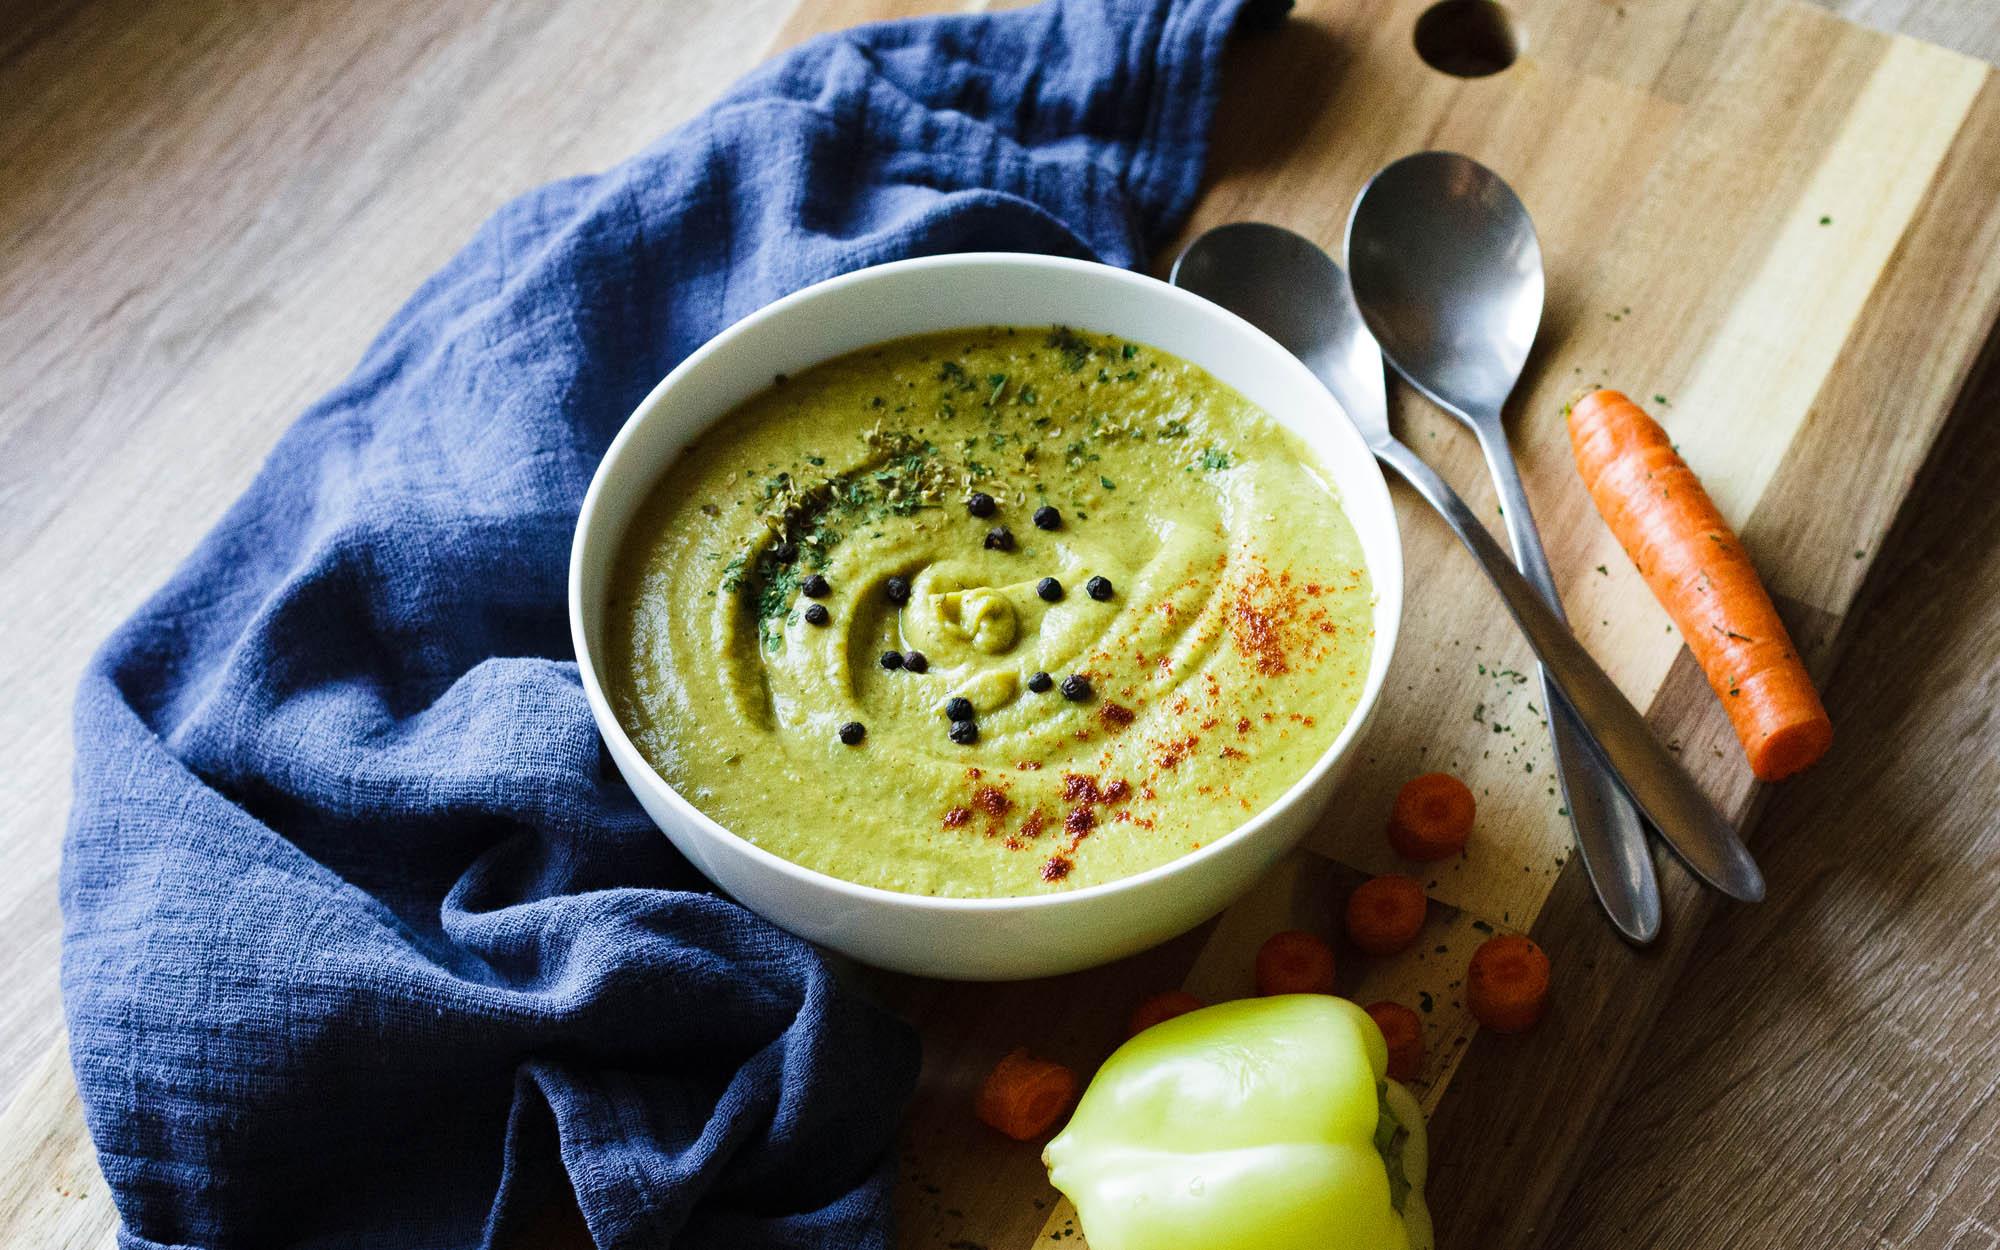 Cream of Green Vegetable Soup (Vegan)